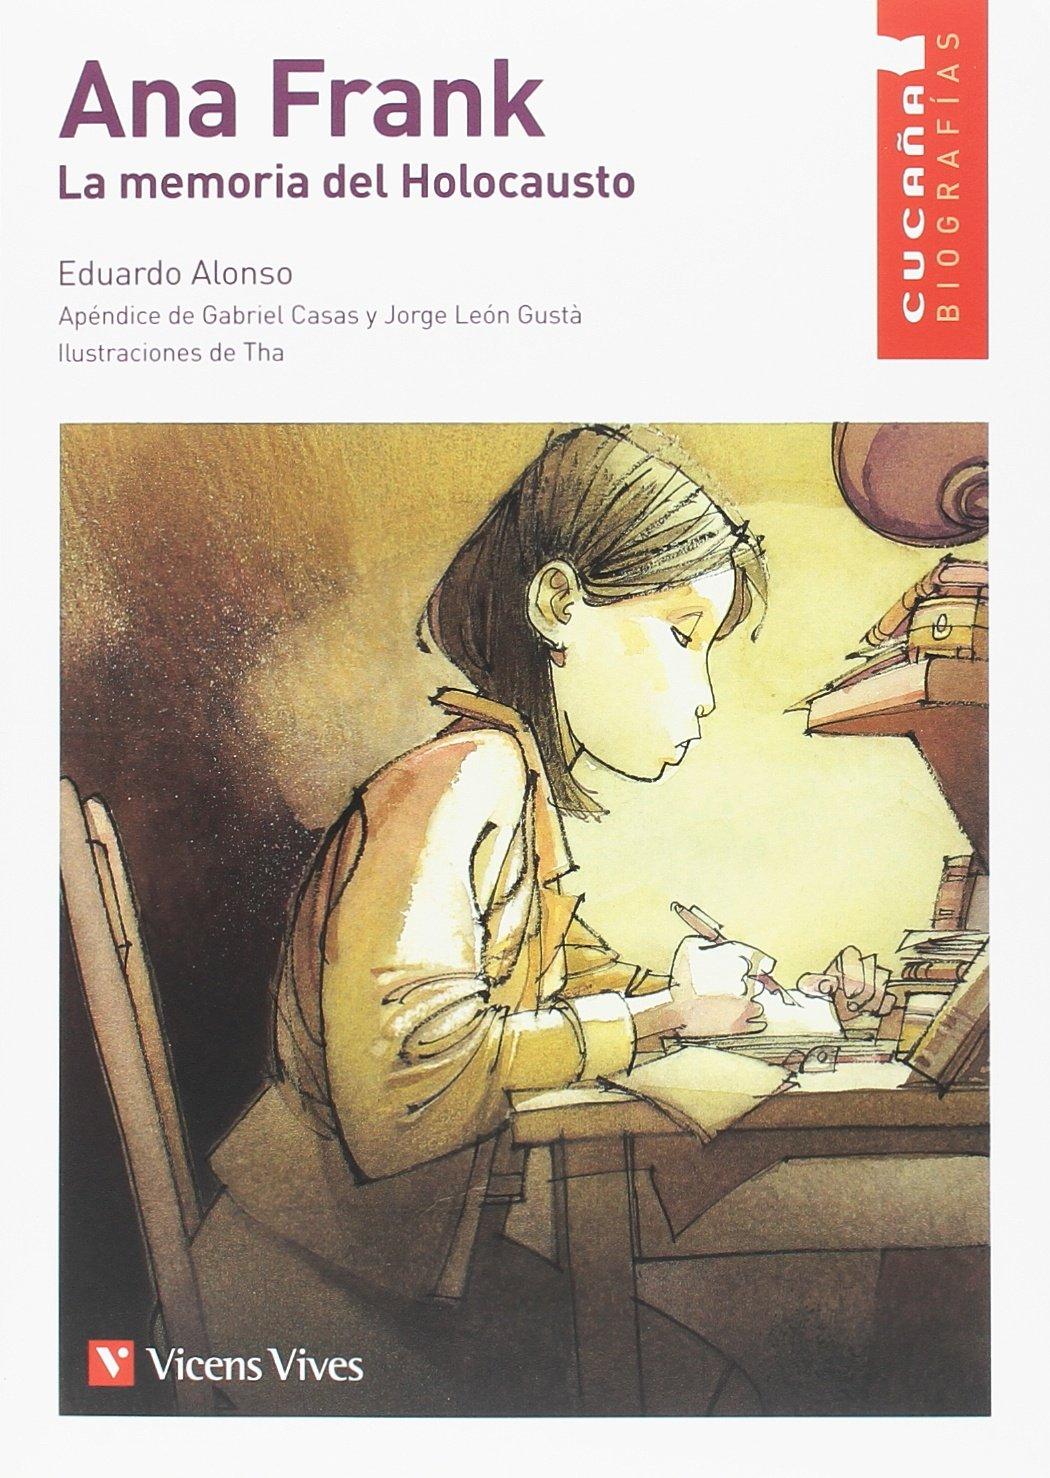 ANA FRANK. LA MEMORIA DEL HOLOCAUSTO (CUCAÑA) (Colección Cucaña) Tapa blanda – 10 may 2018 August Tharrats Ramon Masnou Editorial Vicens Vives 8468222143